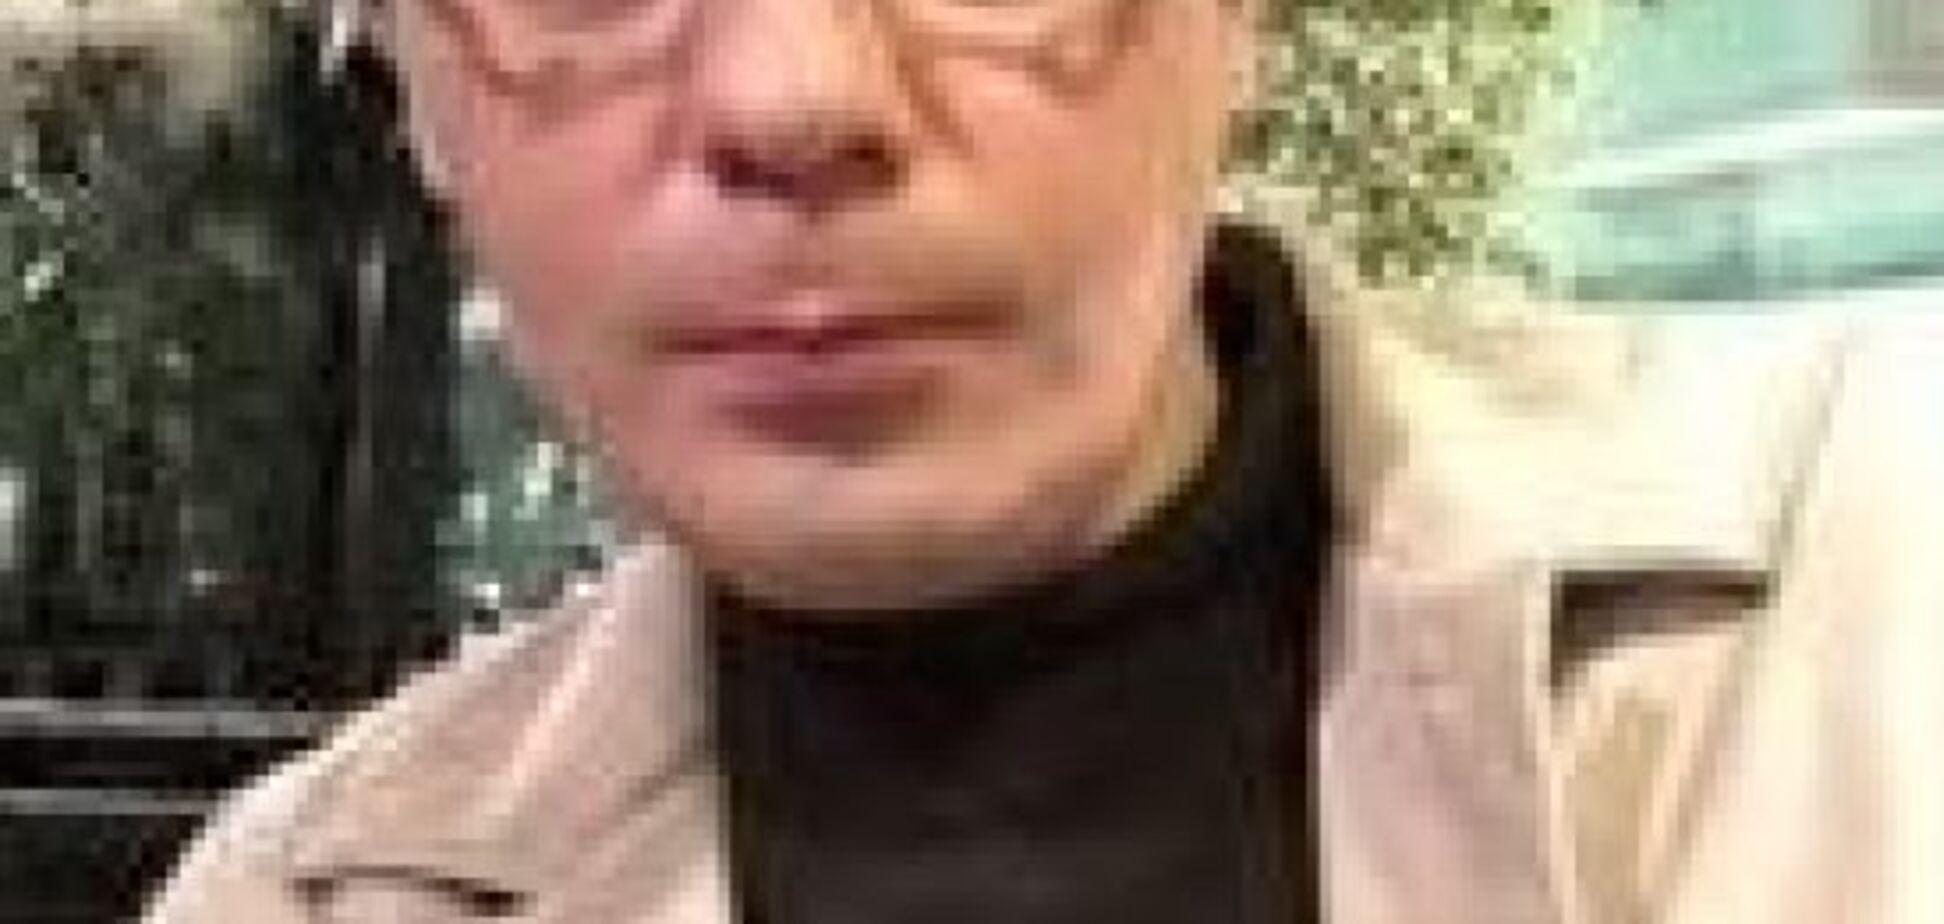 Всплыли подробности ареста экс-нардепа Крючкова в Германии